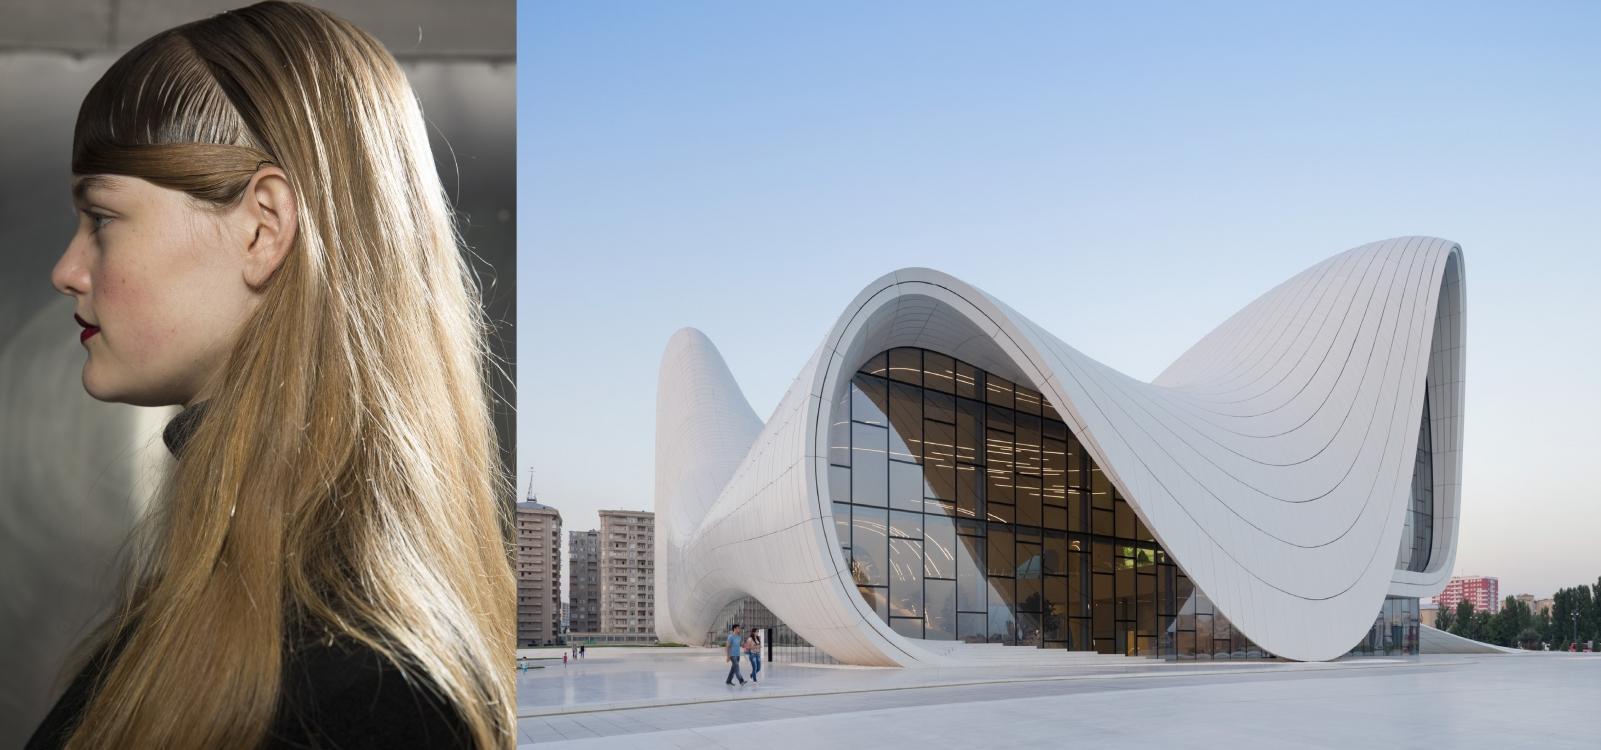 Прическа с показа Mary Katrantzou, осень-зима 2016, и Центр Гейдара Алиева (архитектор - Заха Хадид) в Баку